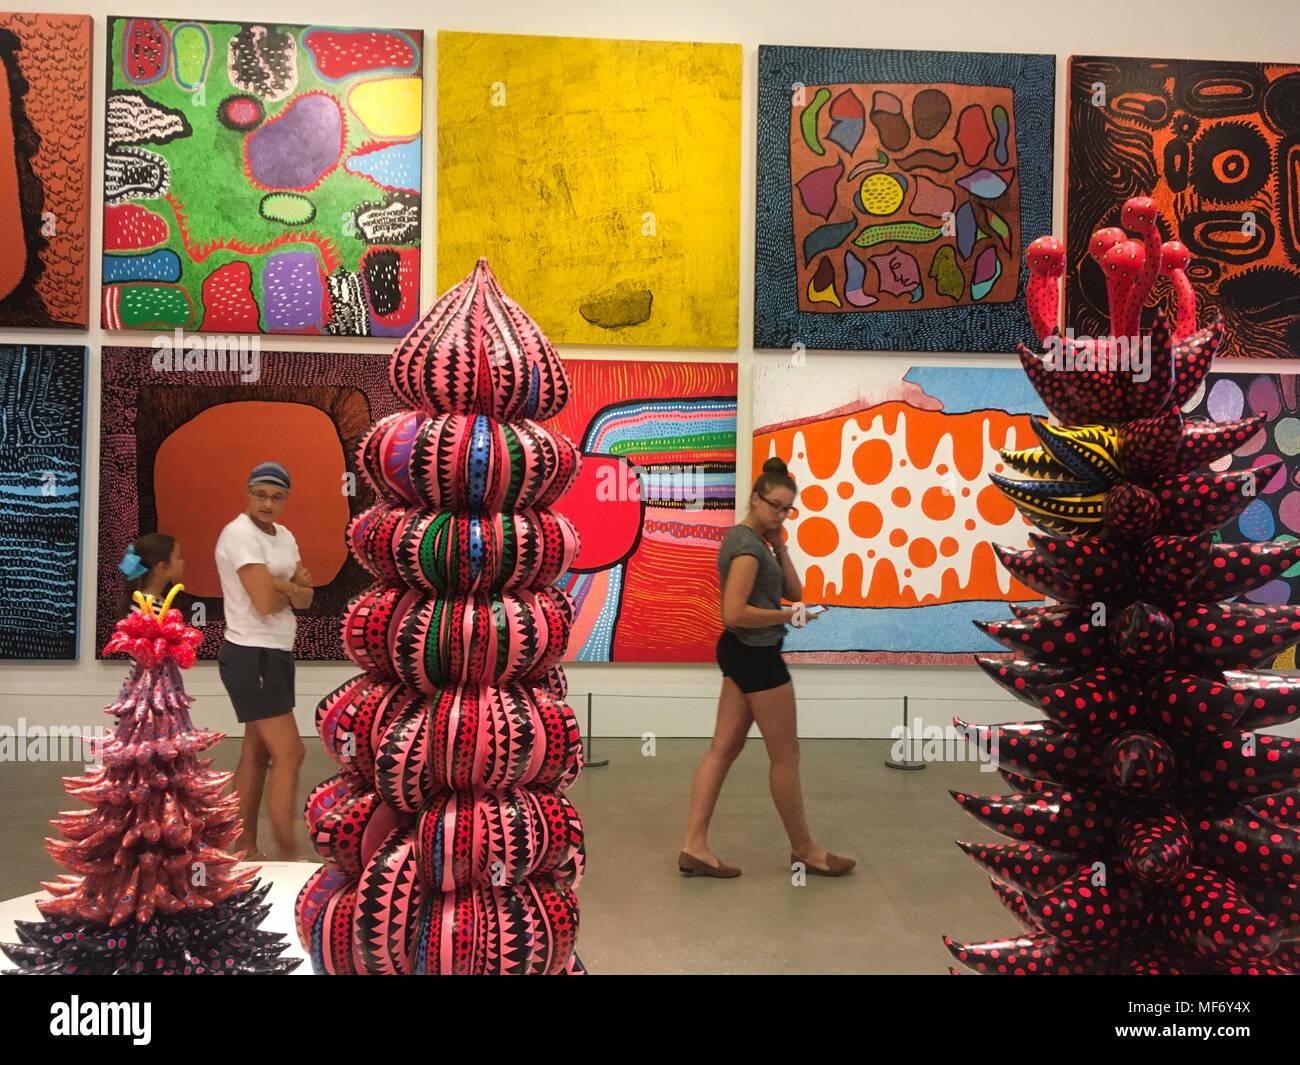 Yayoi Kusama 'Life is the Heart of a Rainbow' art exhibition, in Brisbane, Australia, on 19 January 2018. - Stock Image